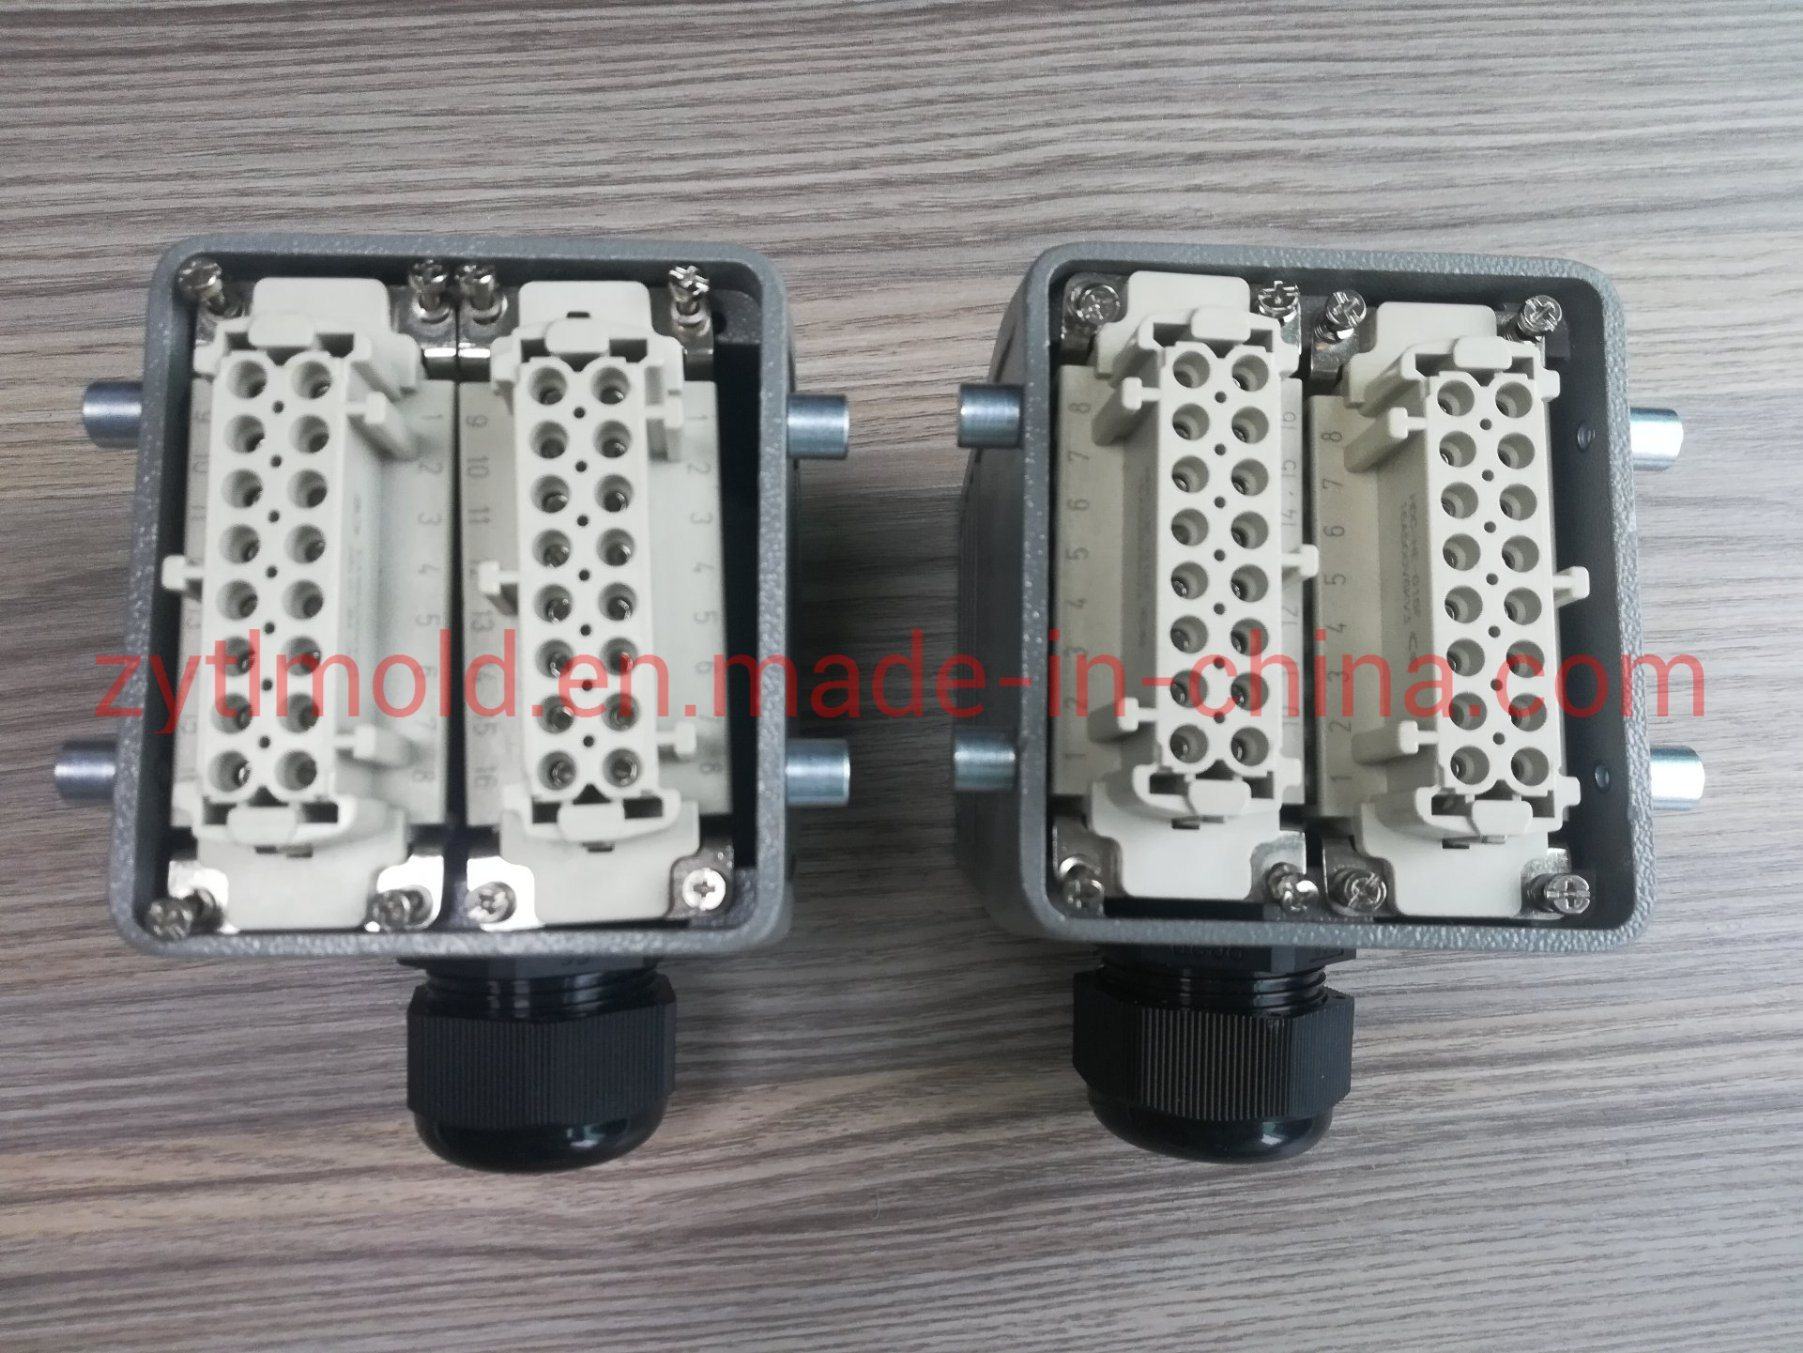 Conector de accesorios de canal caliente